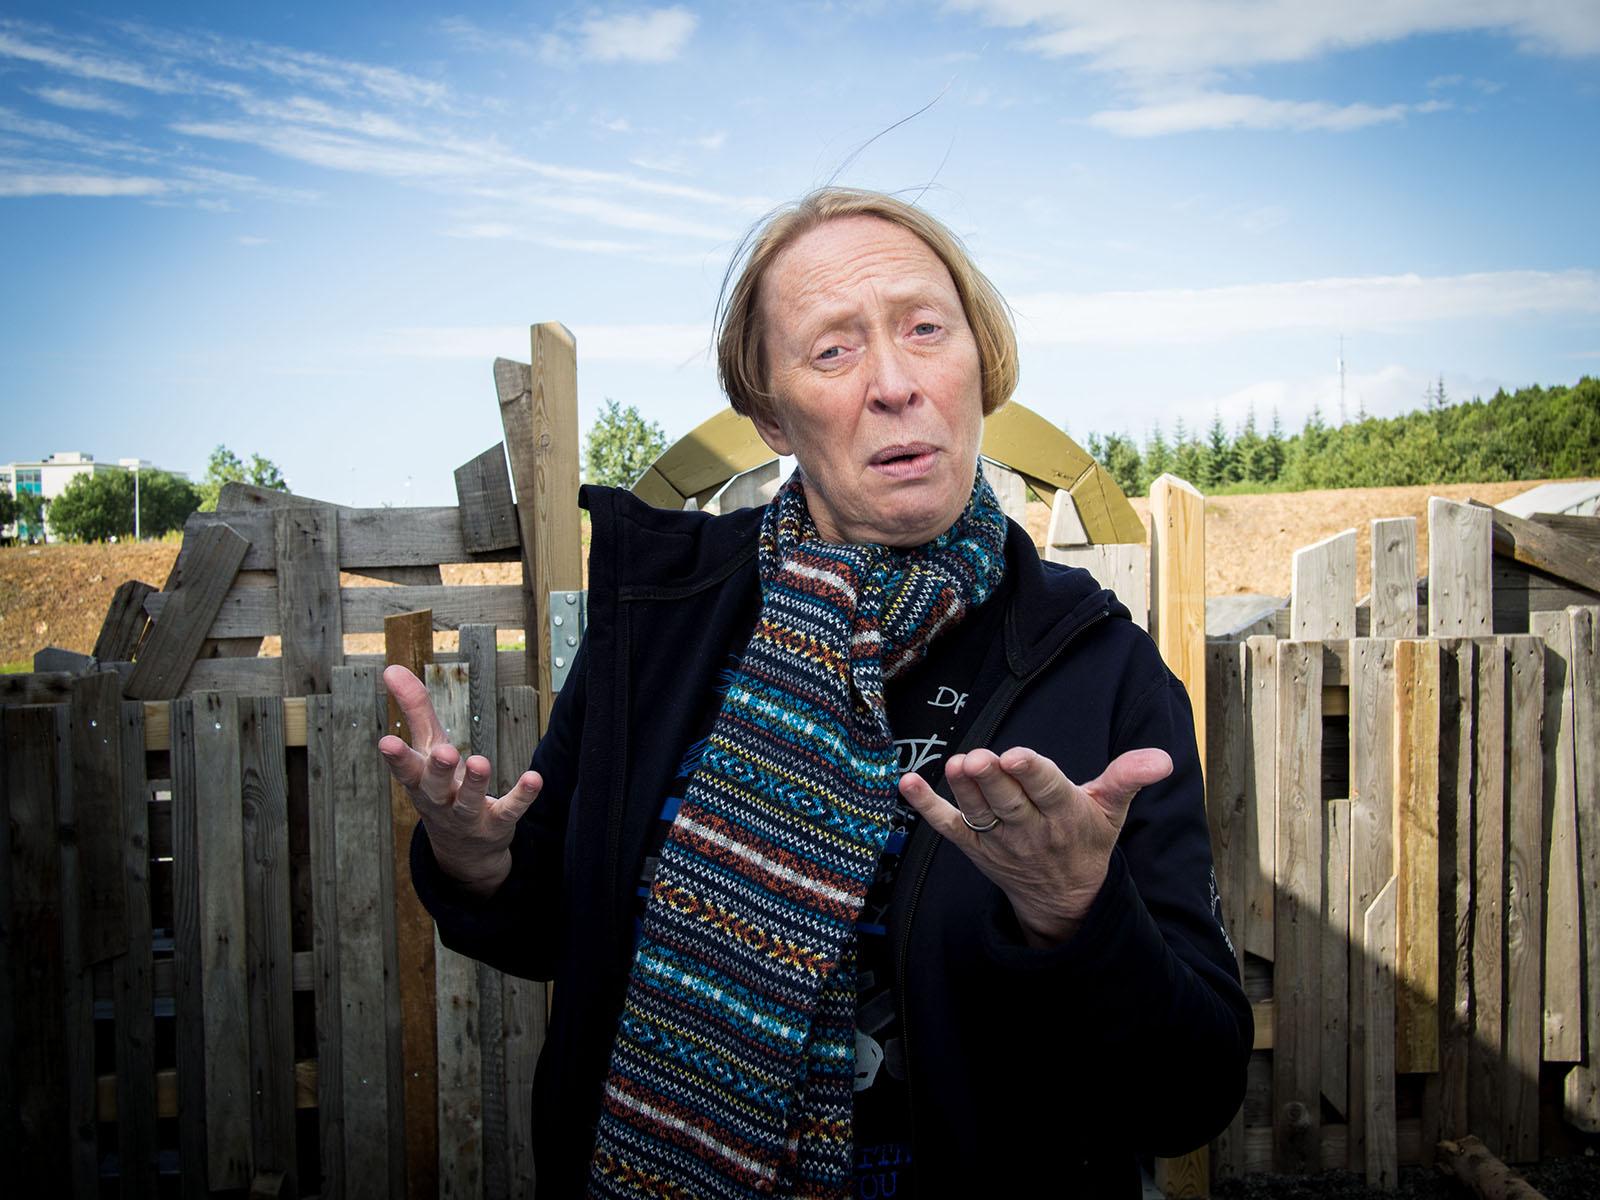 Margrét Pála, founder and CEO of Hjalli schools in Reykjavík